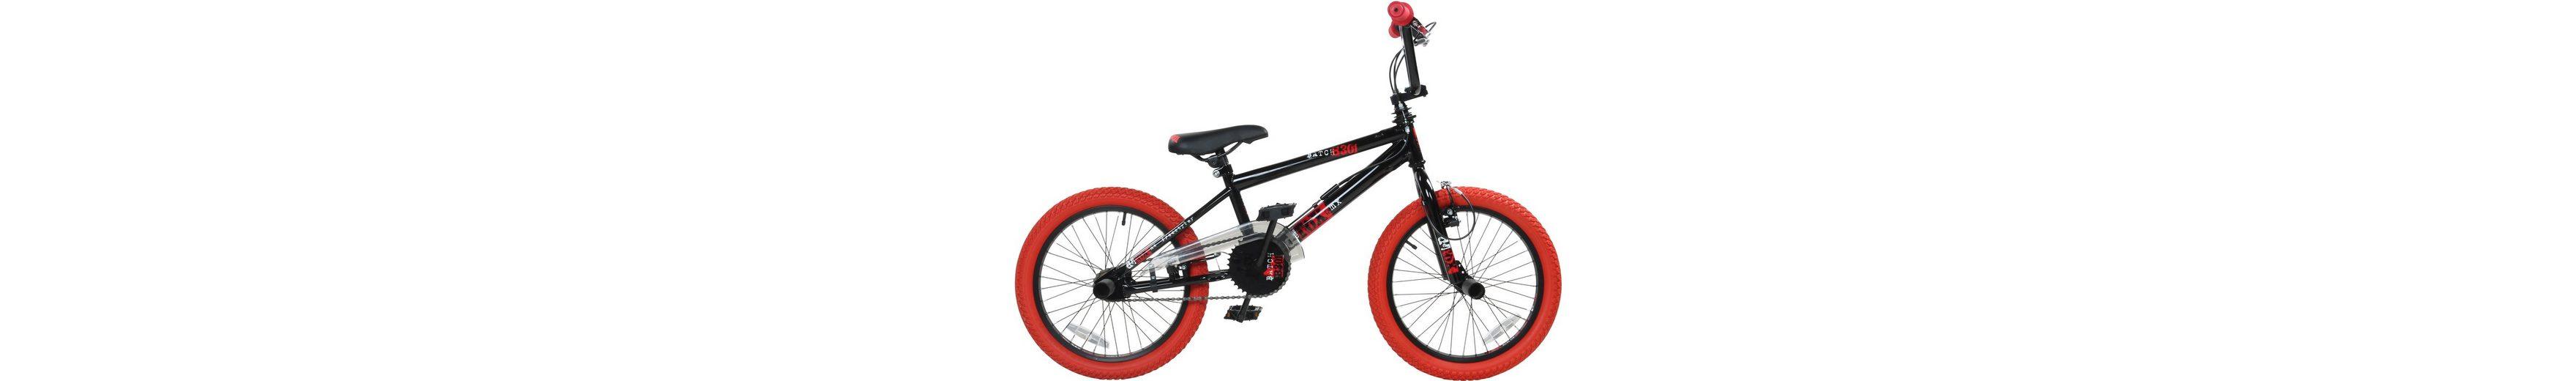 DeTox BMX, 18 Zoll, schwarz/rot, »DeTox Freestyle«